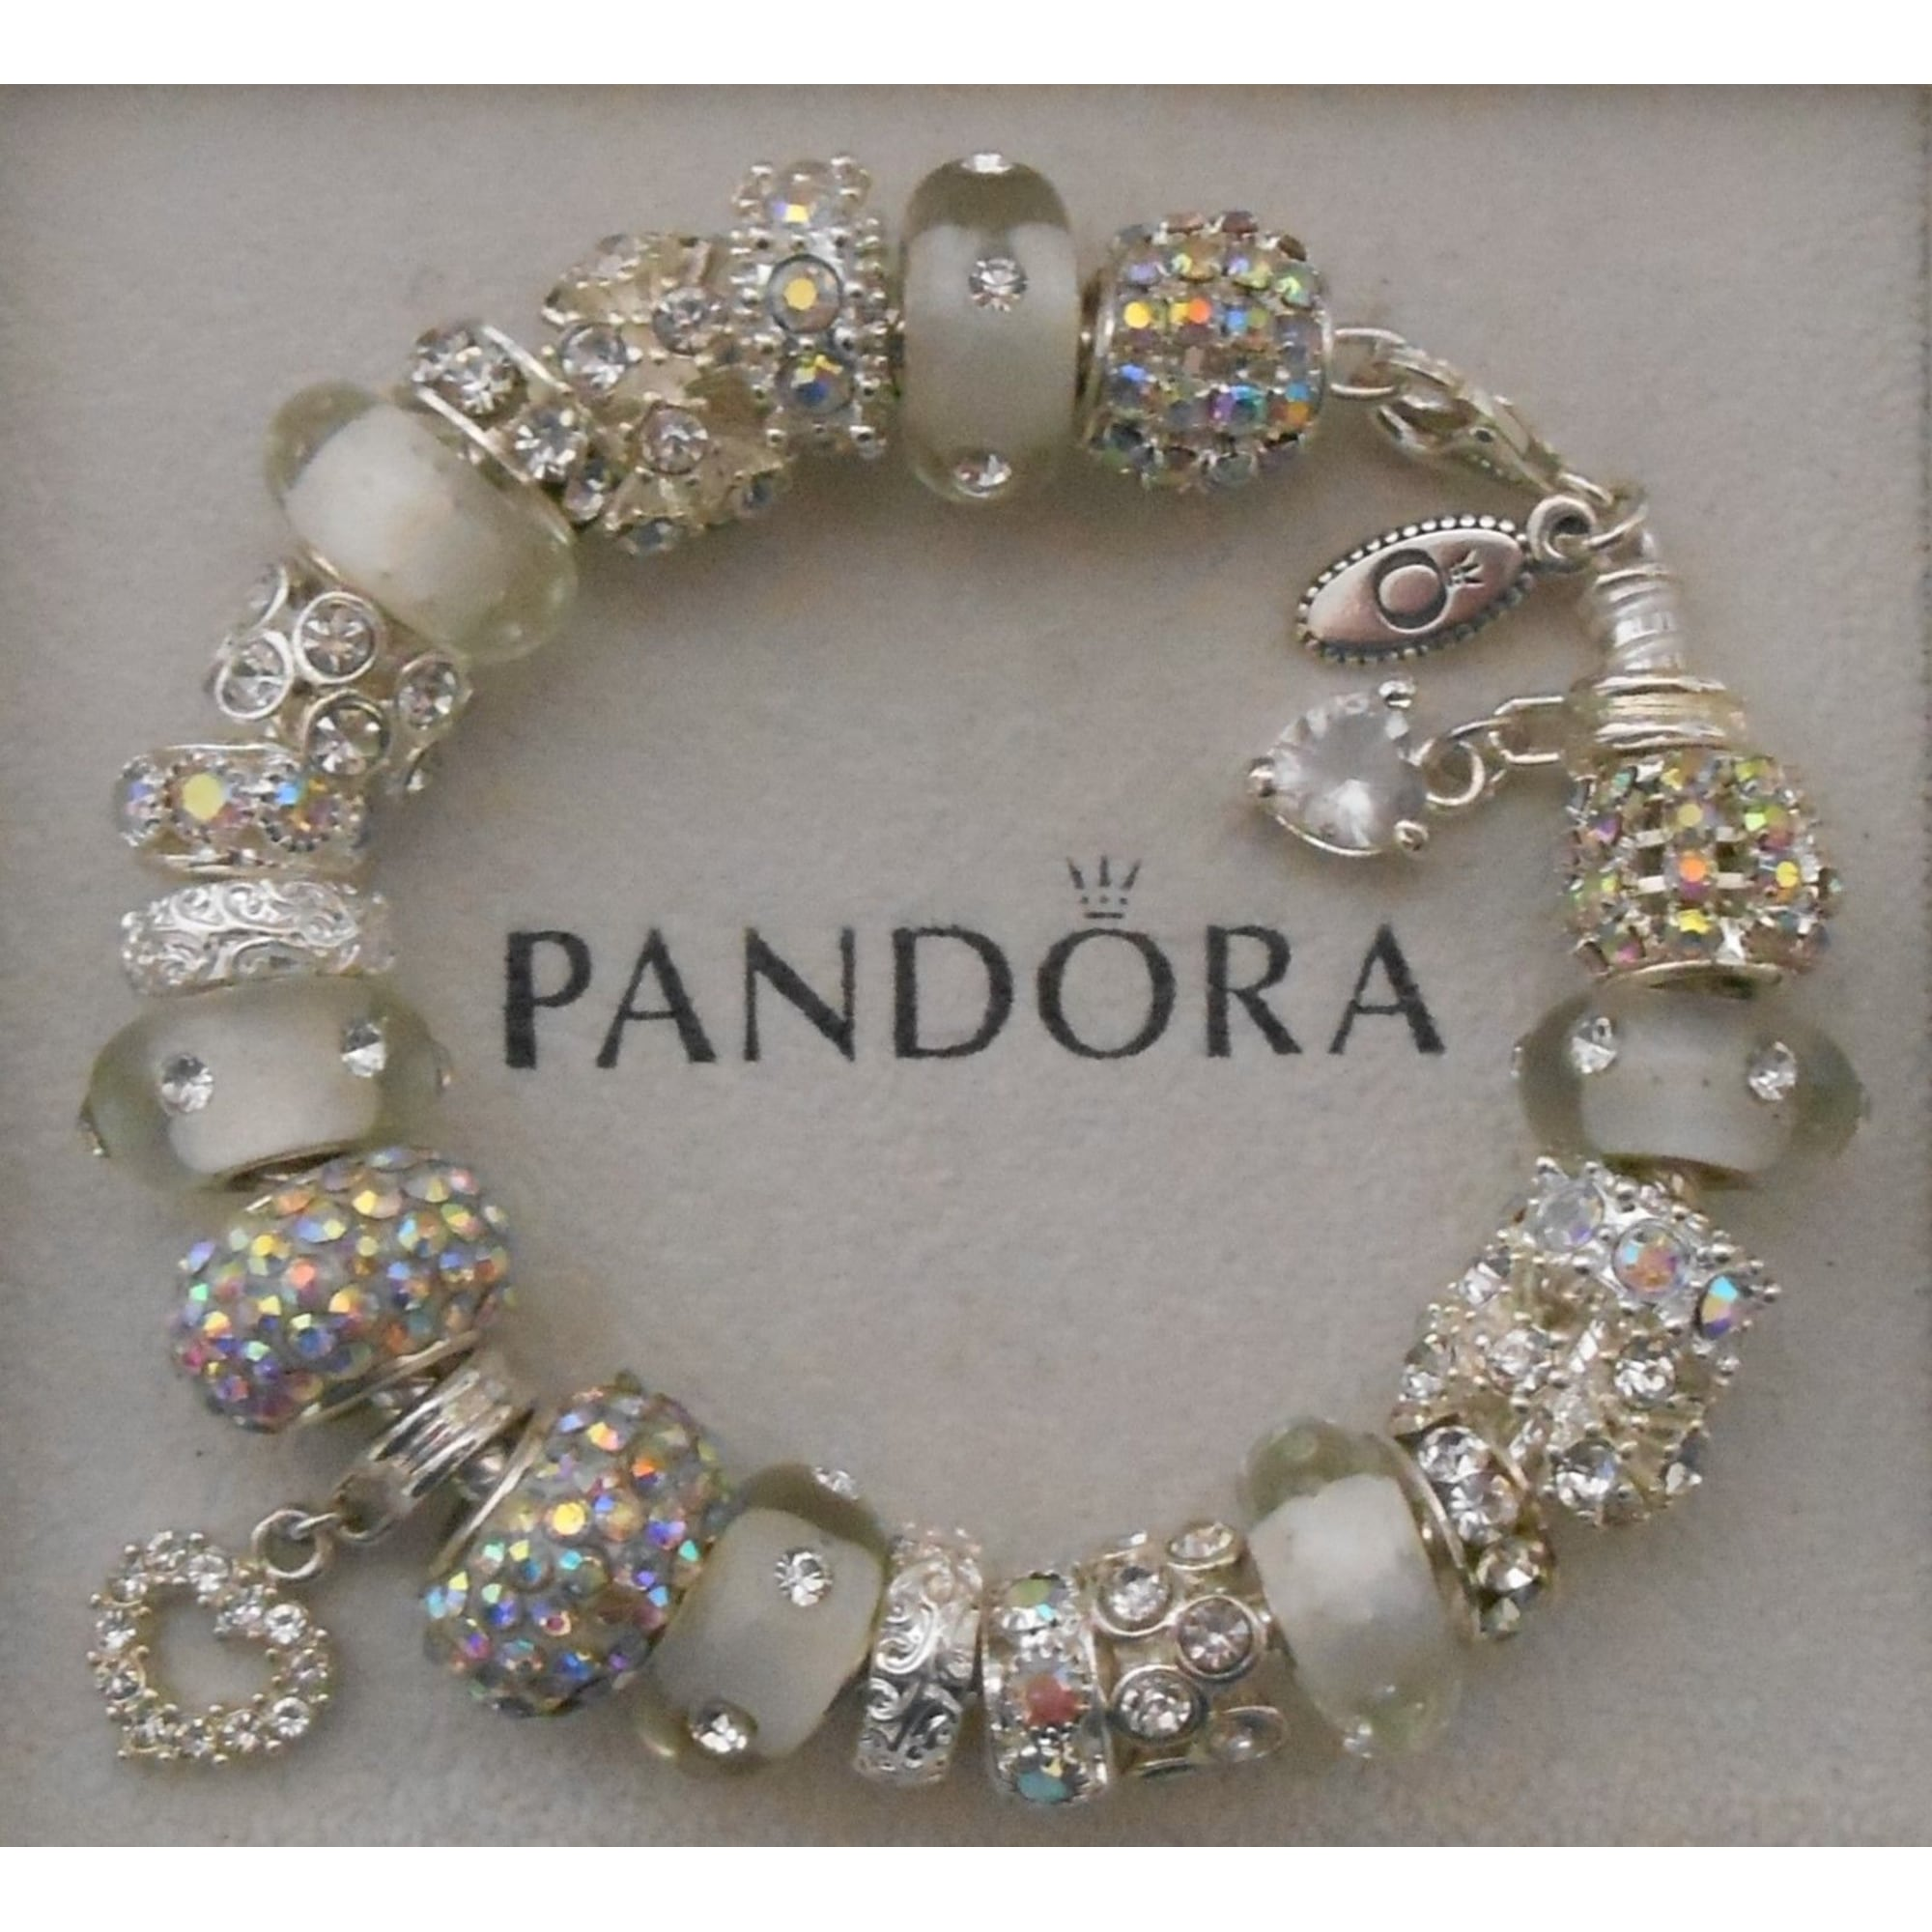 bracelet pandora blanche neige